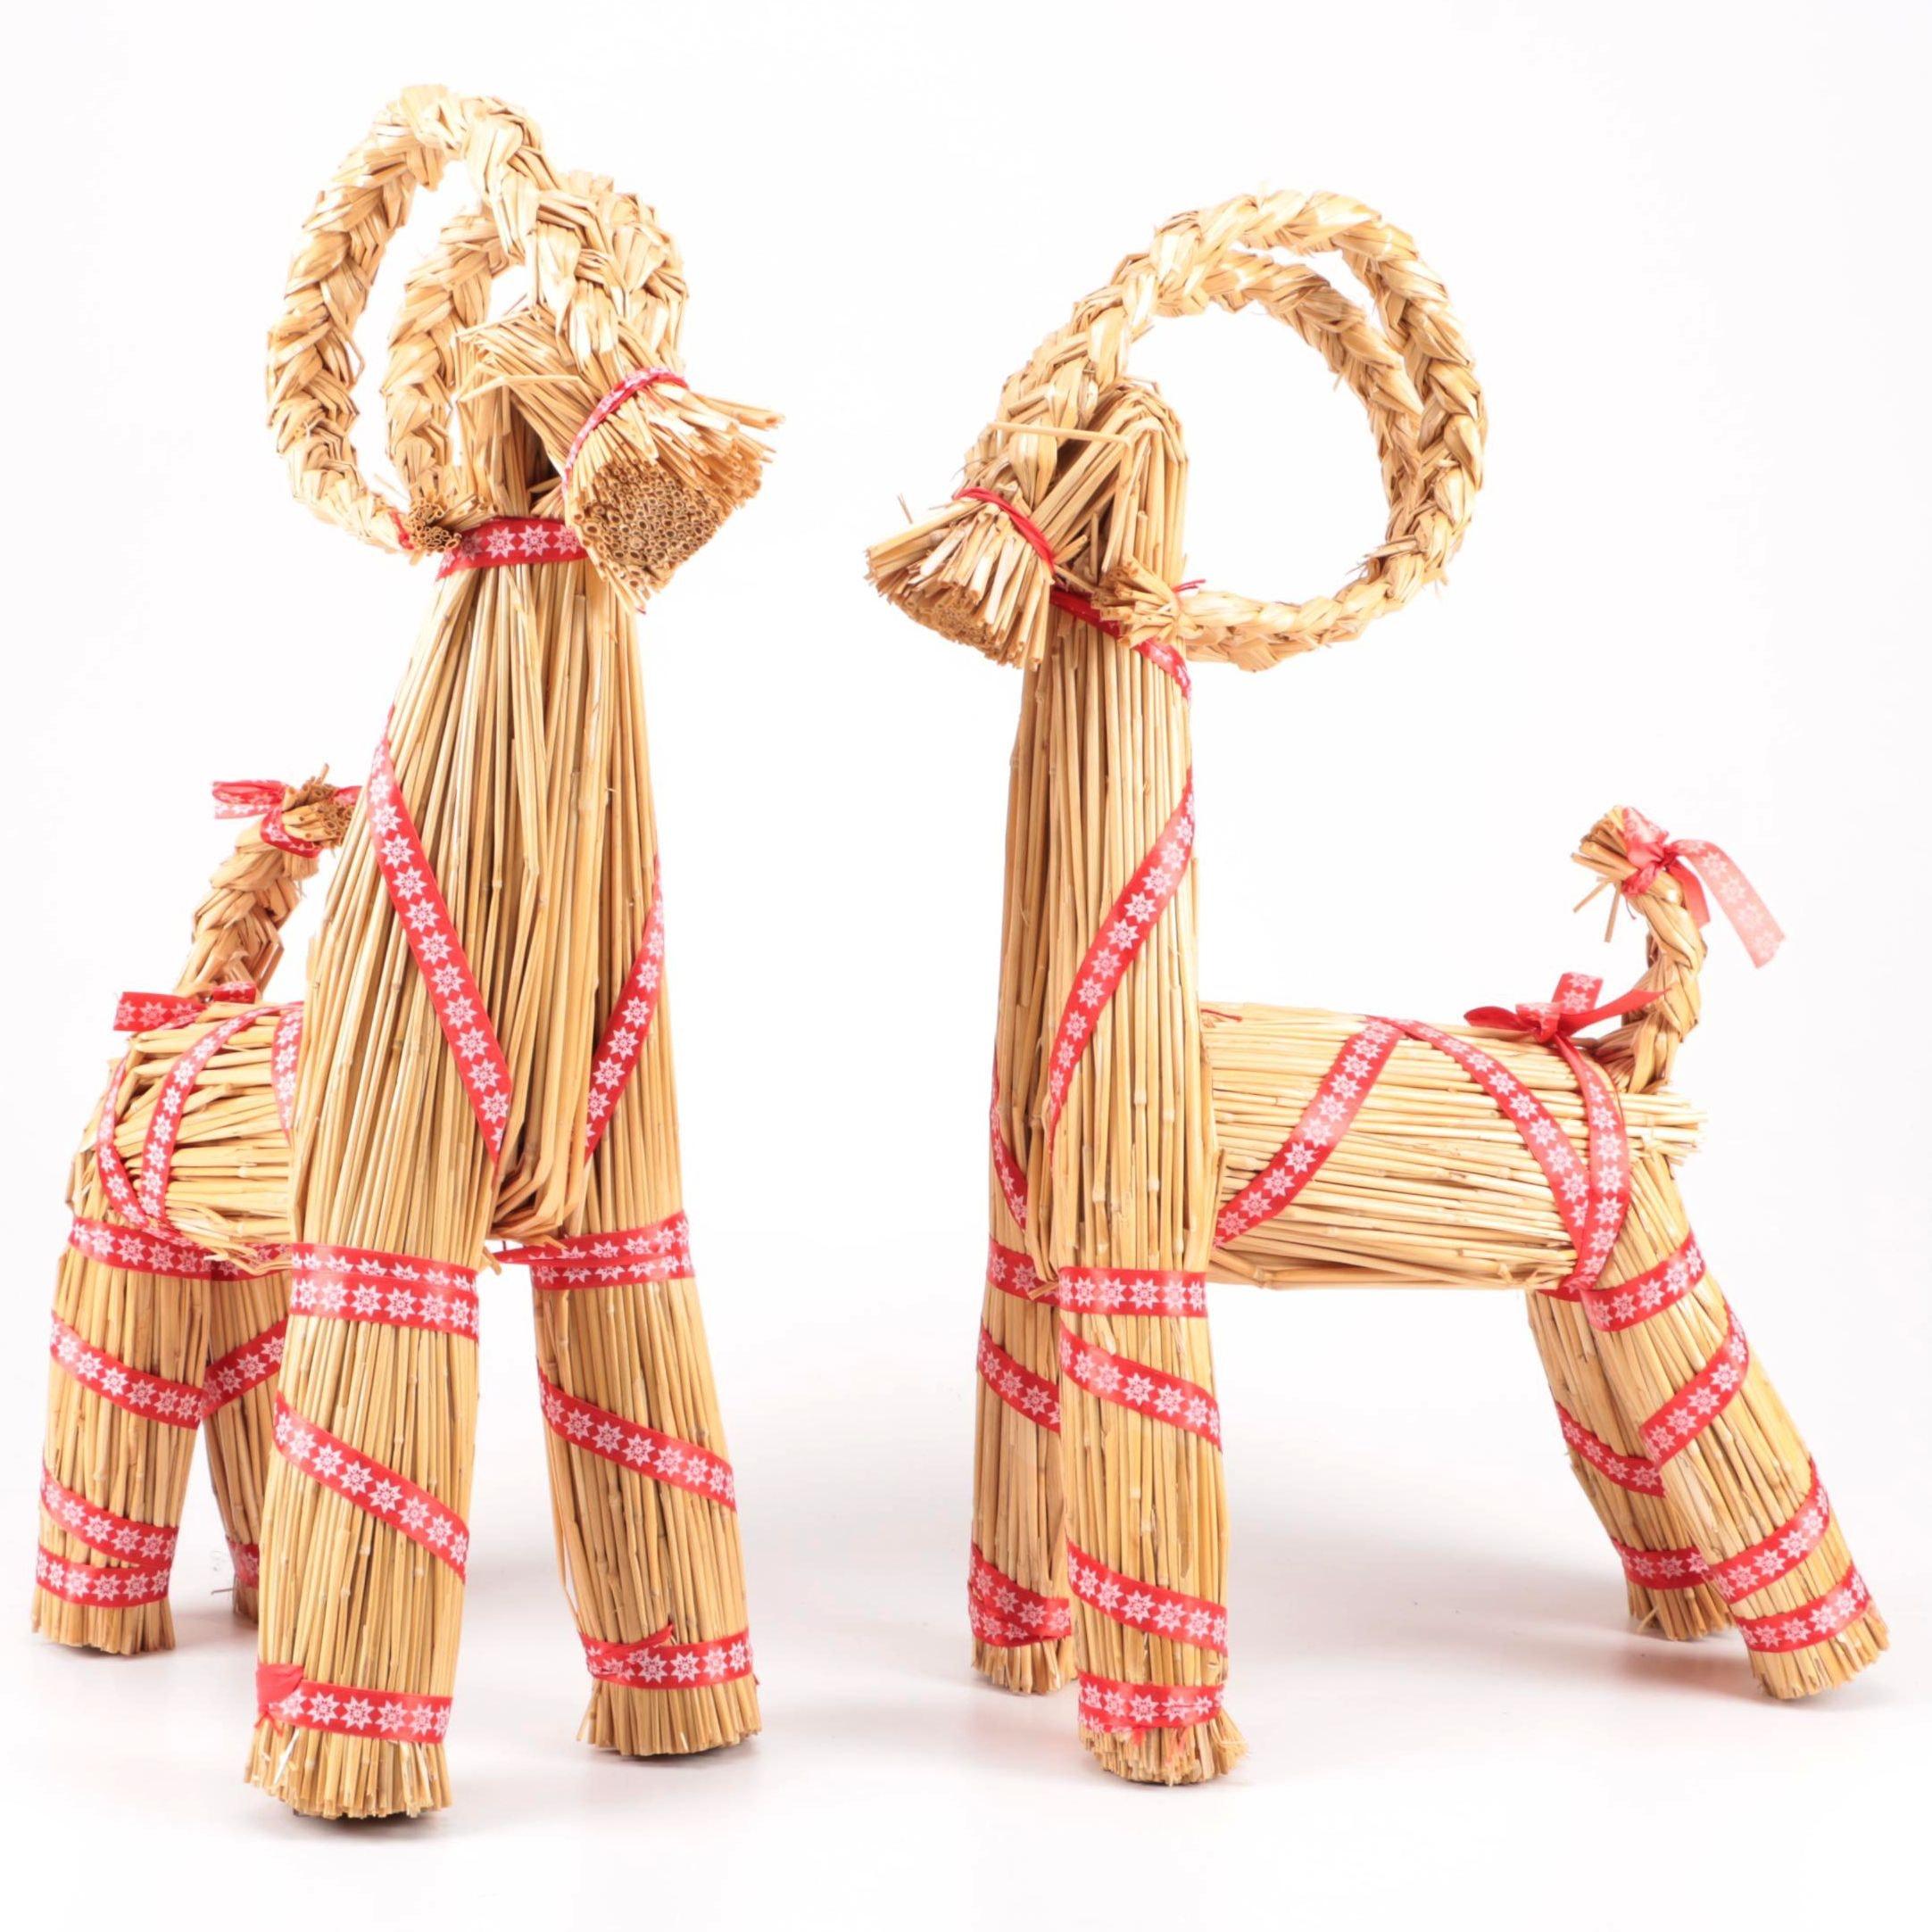 Swedish Julbock Straw Christmas Goats